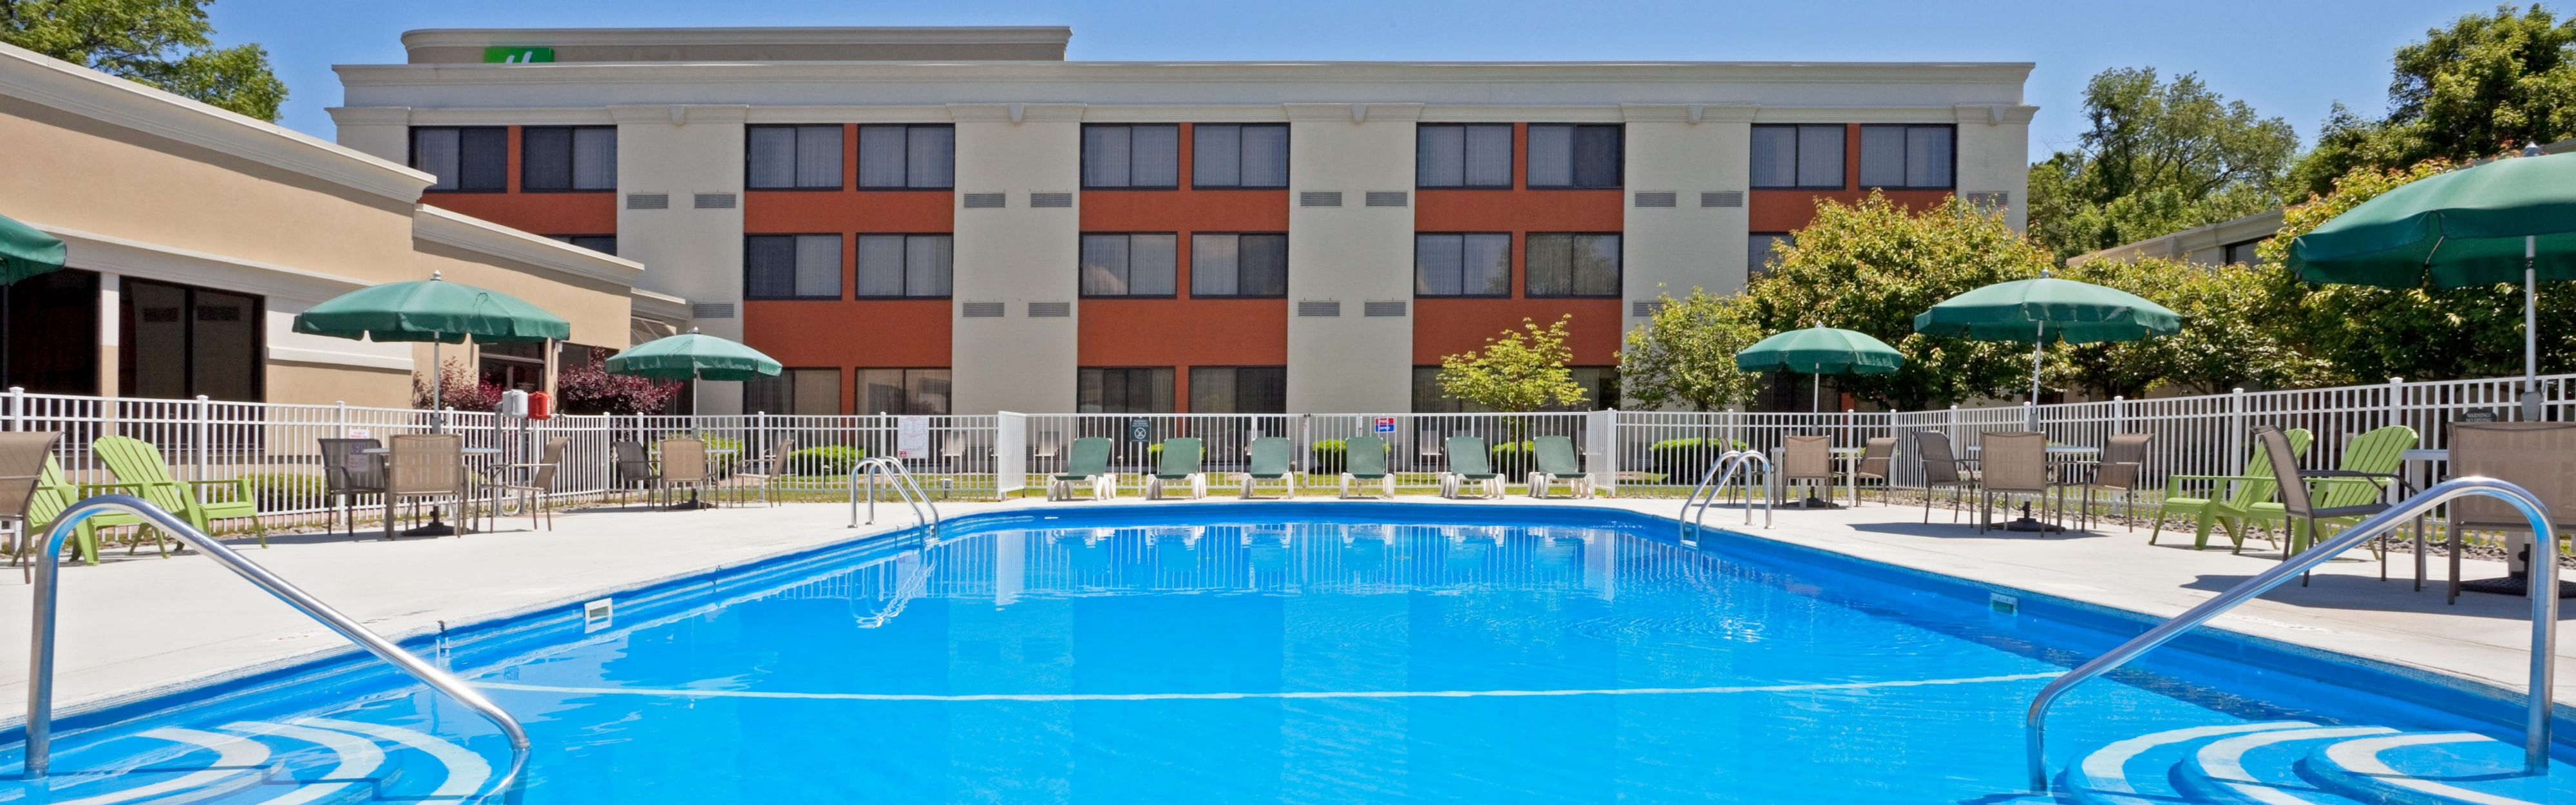 Holiday Inn Orangeburg-Rockland/Bergen Co image 2